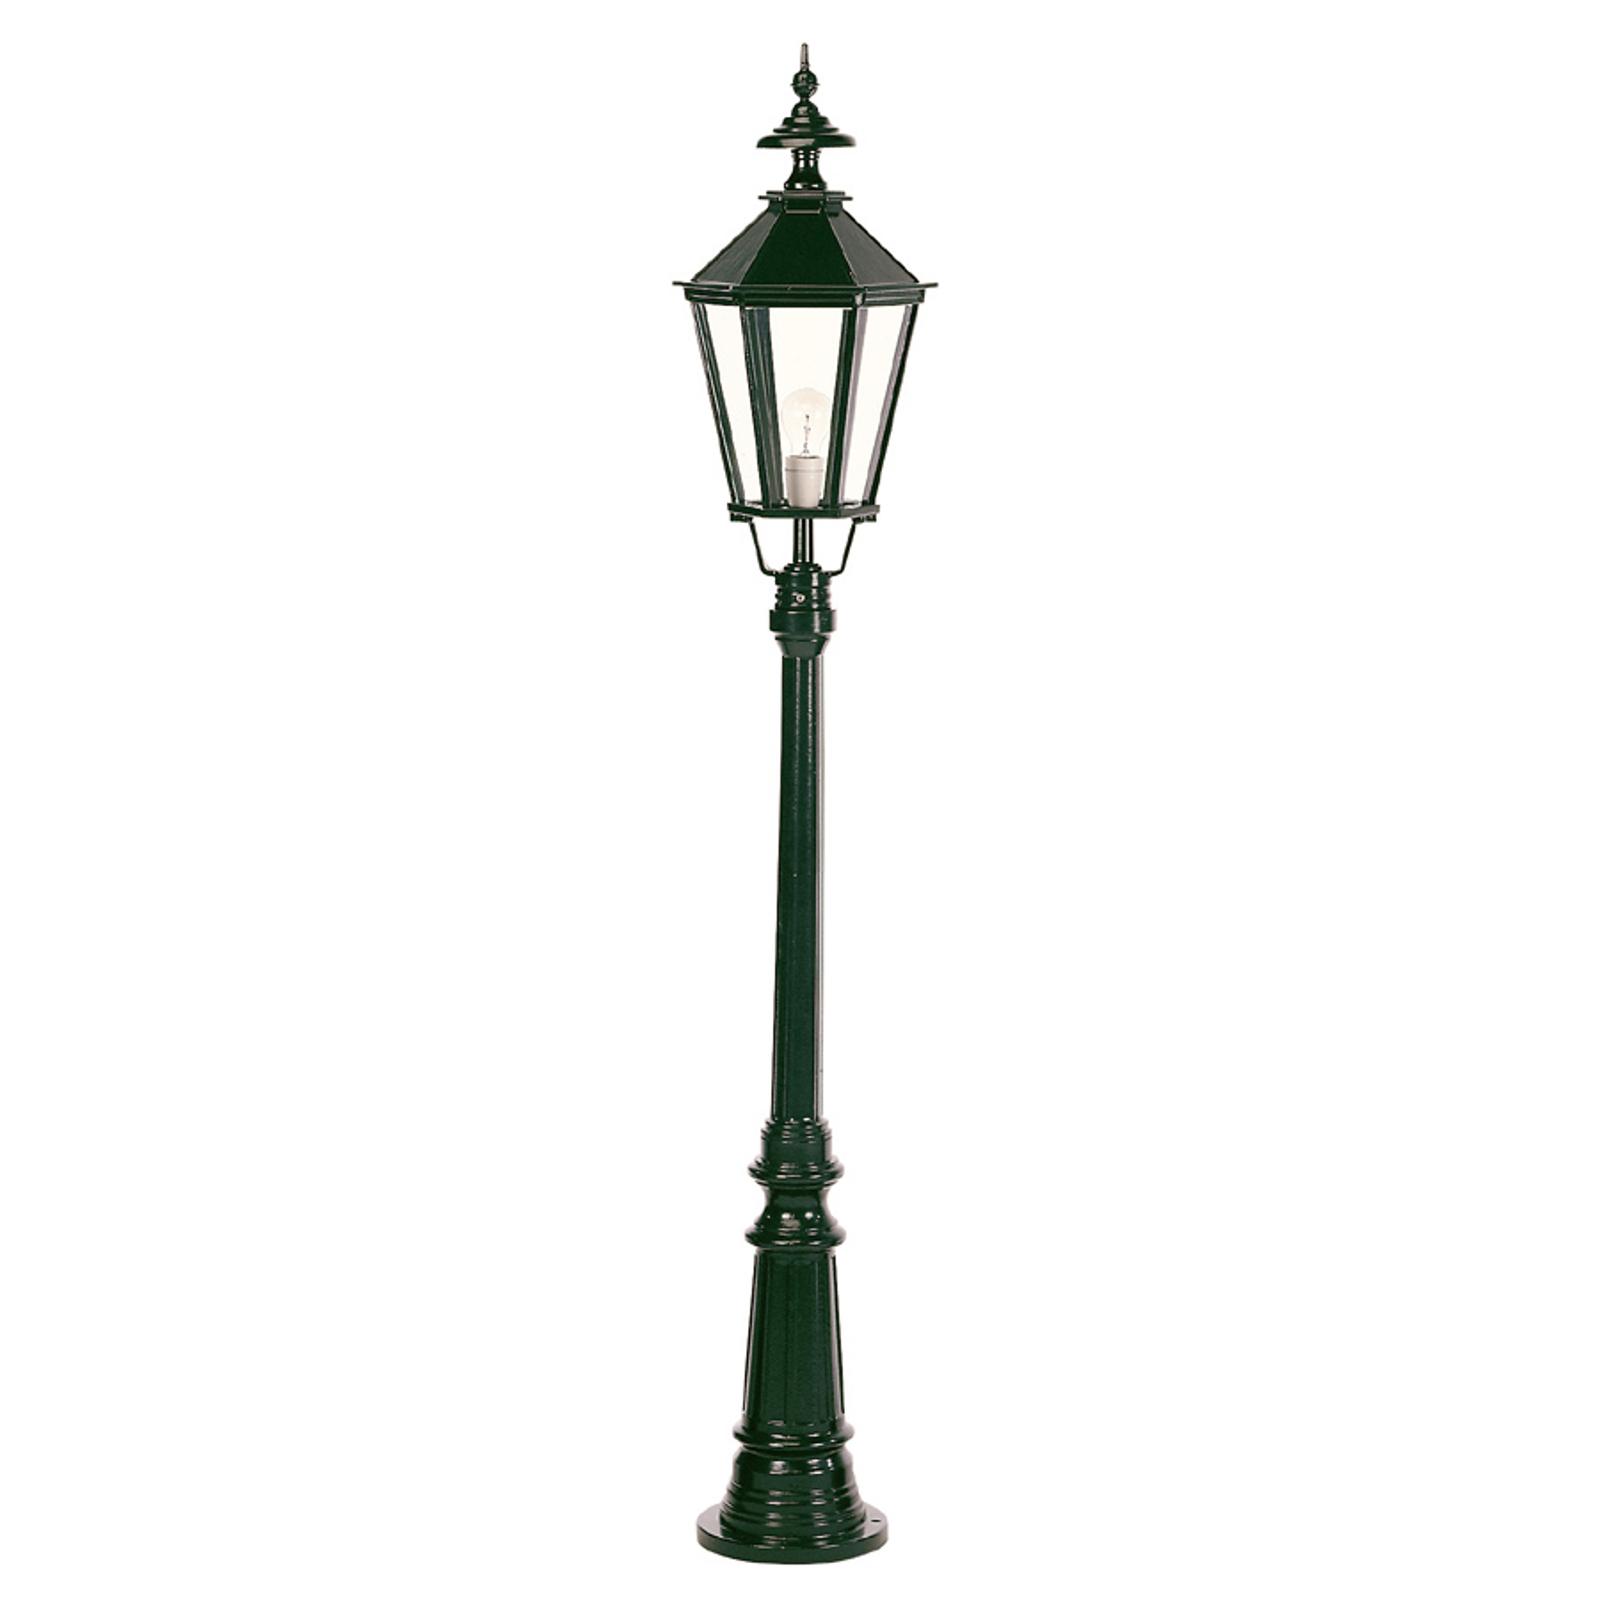 Piękna latarnia ogrodowa Dublin 1-punktowa, czarna